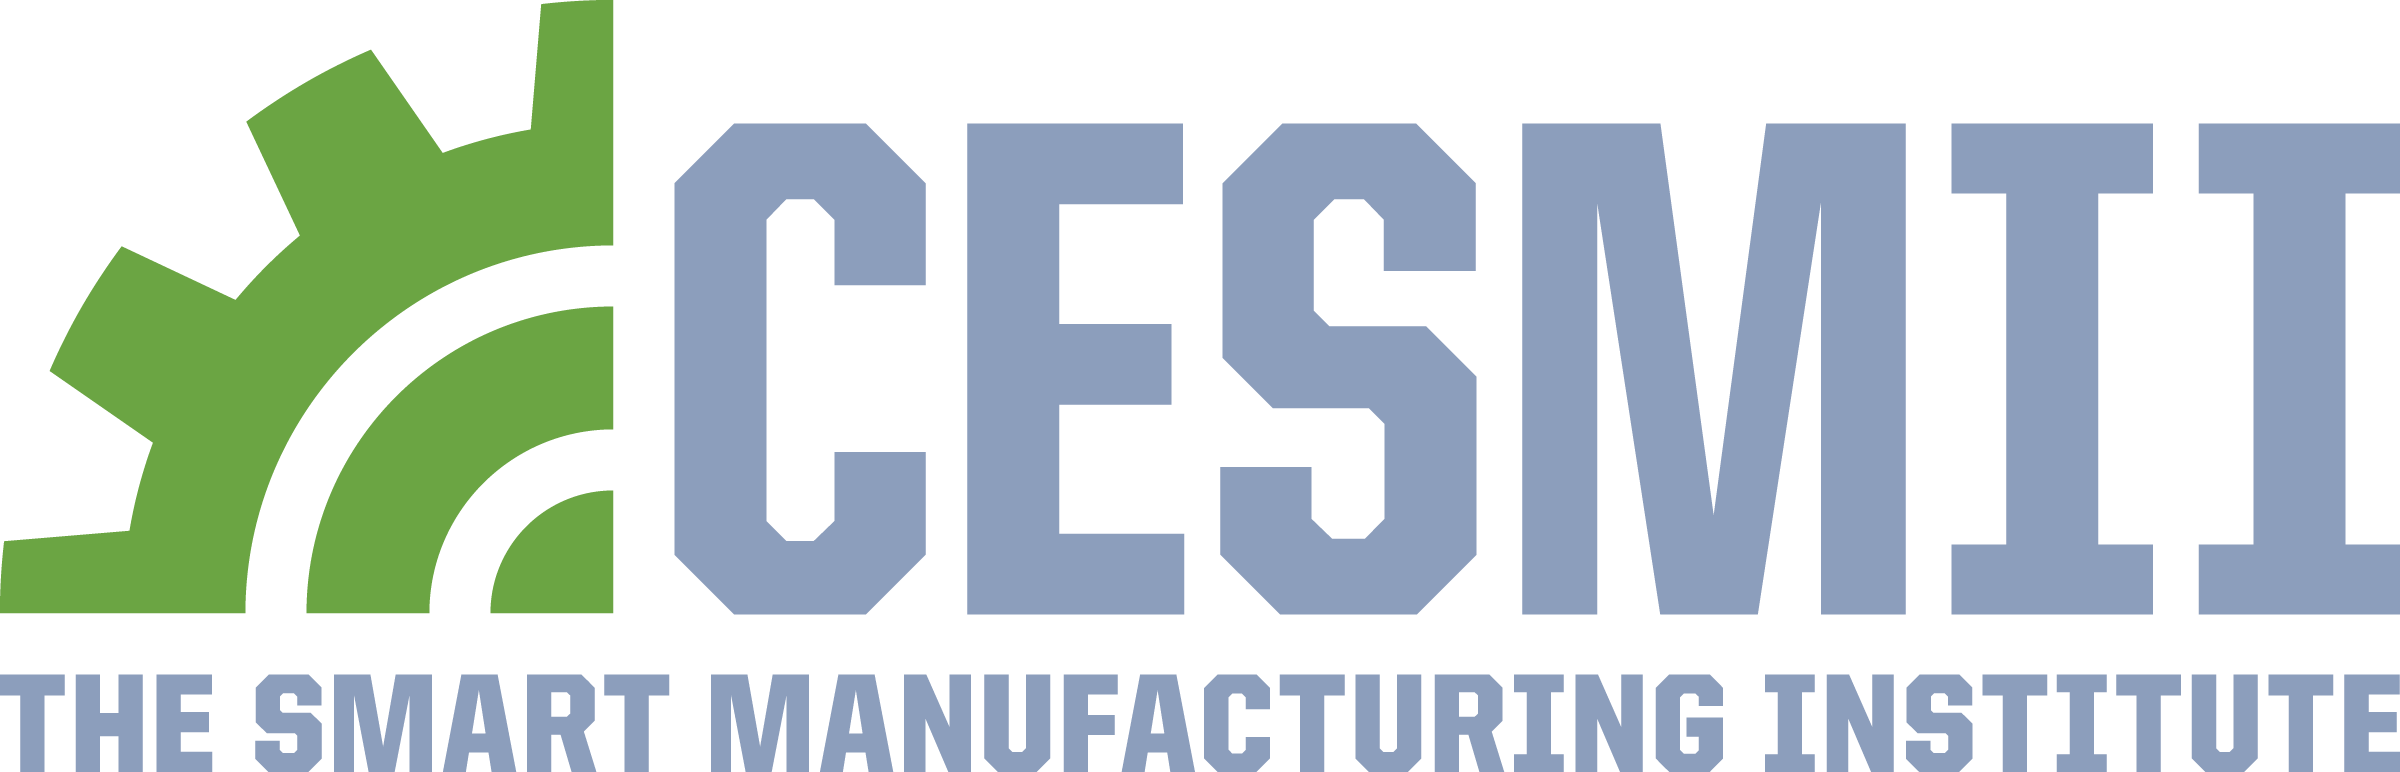 CESMII - The Smart Manufacturing Institute